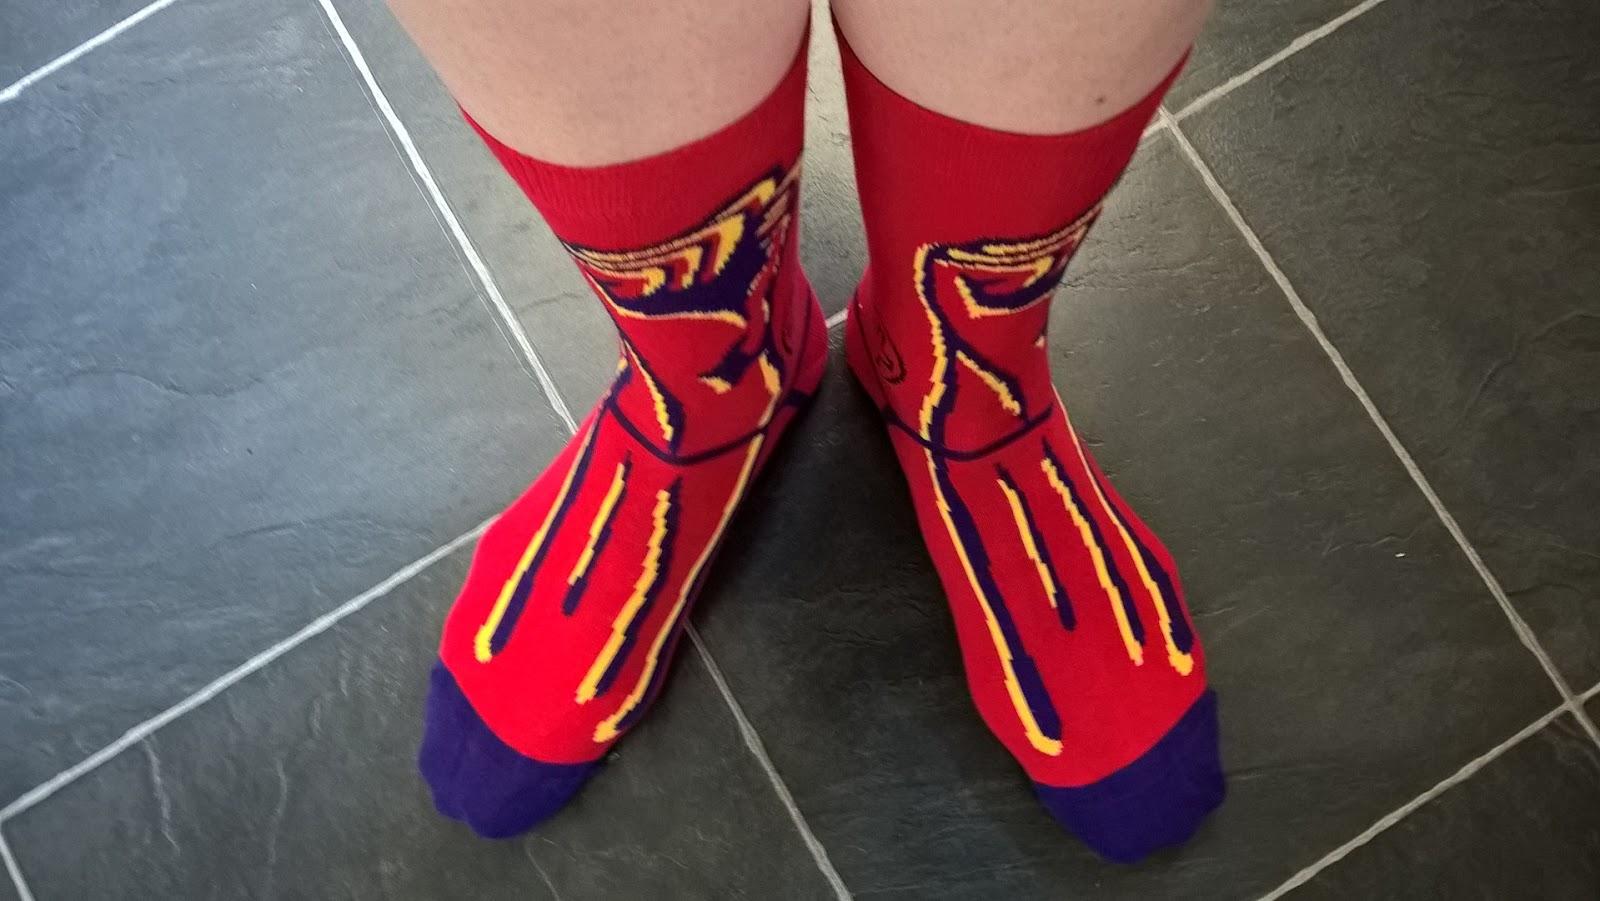 Stand4socks Child Health Sock - motherdistracted.co.uk